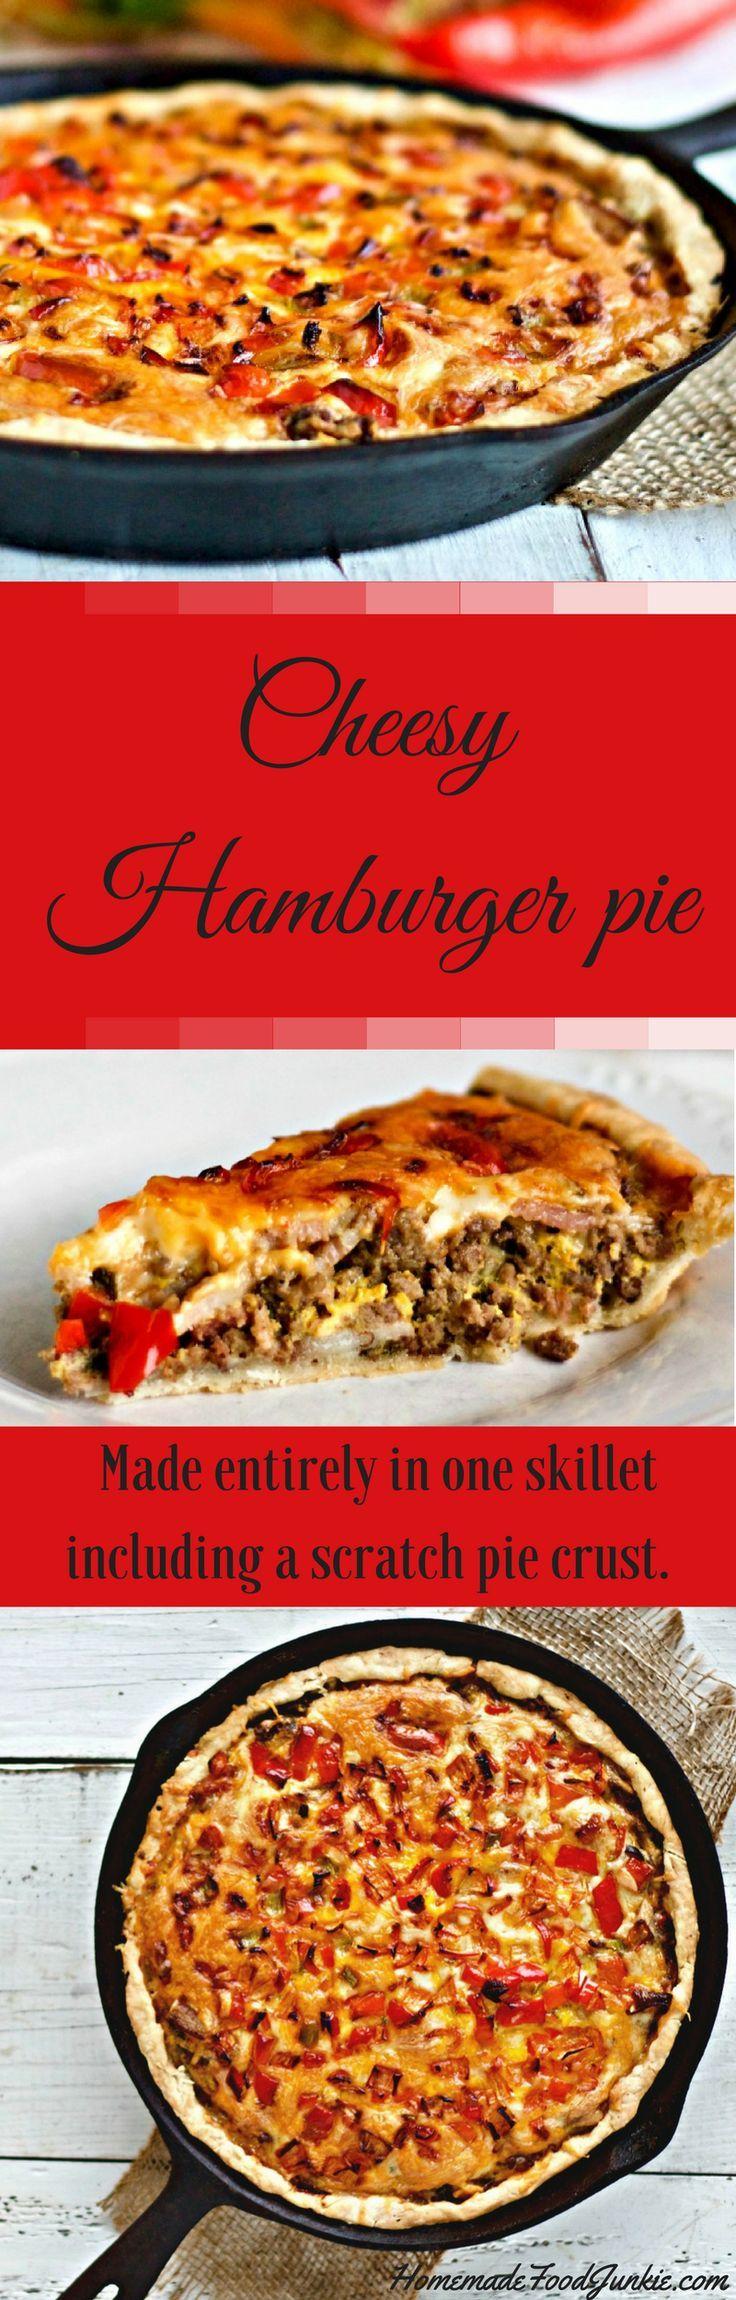 Cheesy Hamburger Pie is an easy one skillet dinner. Warm, filling man pleasing comfort food.